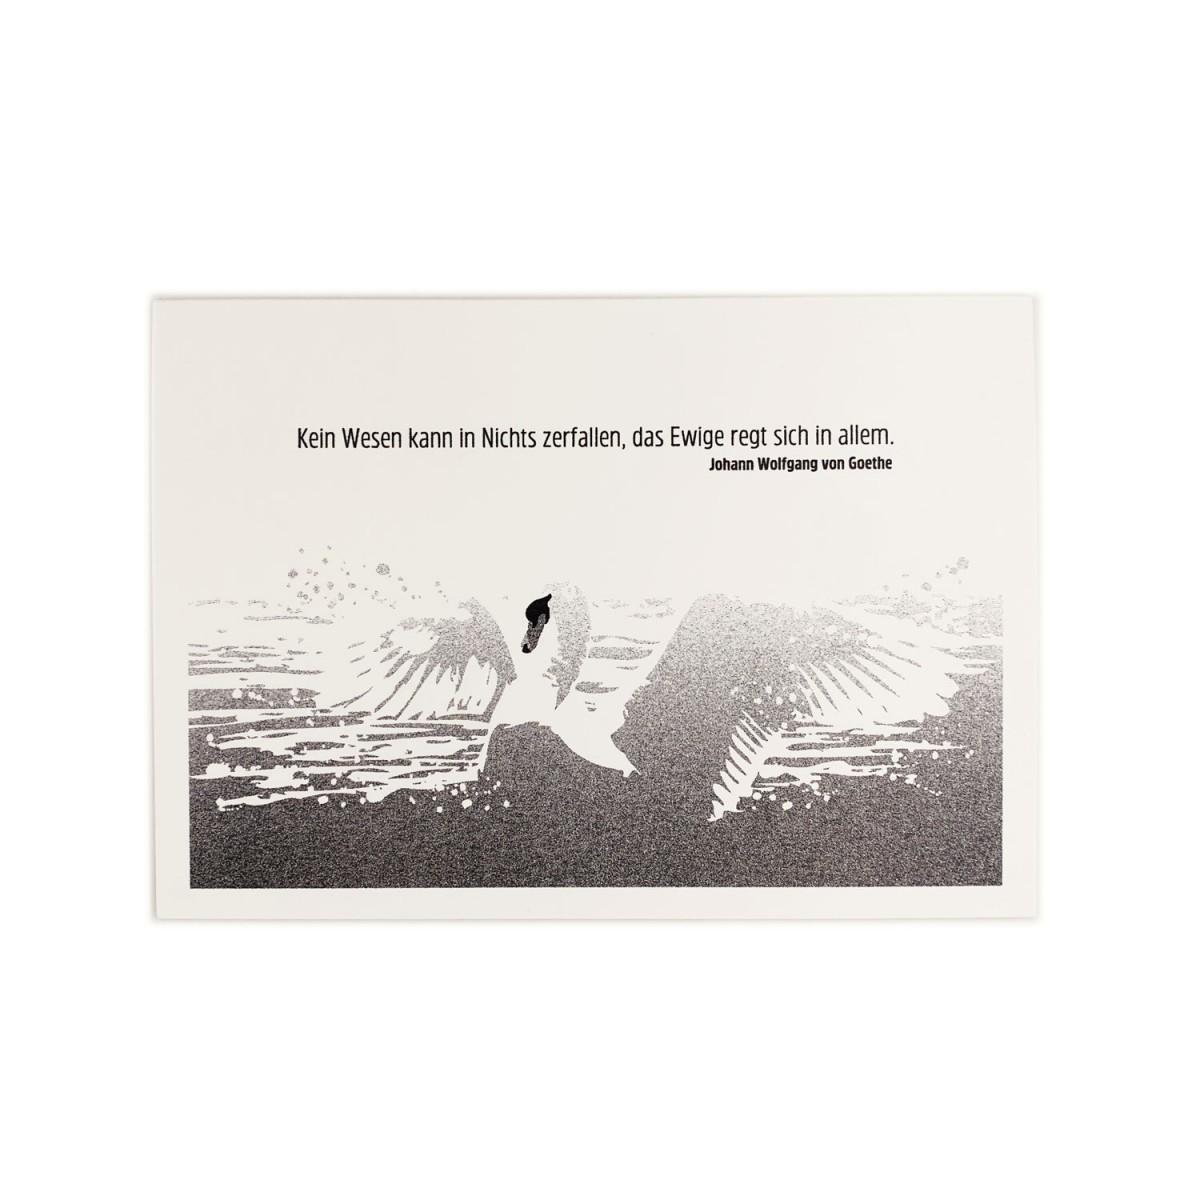 Feingeladen // MAGIC WORDS // Goethe Zitat (BK) // RISO-Klappkarte, A6